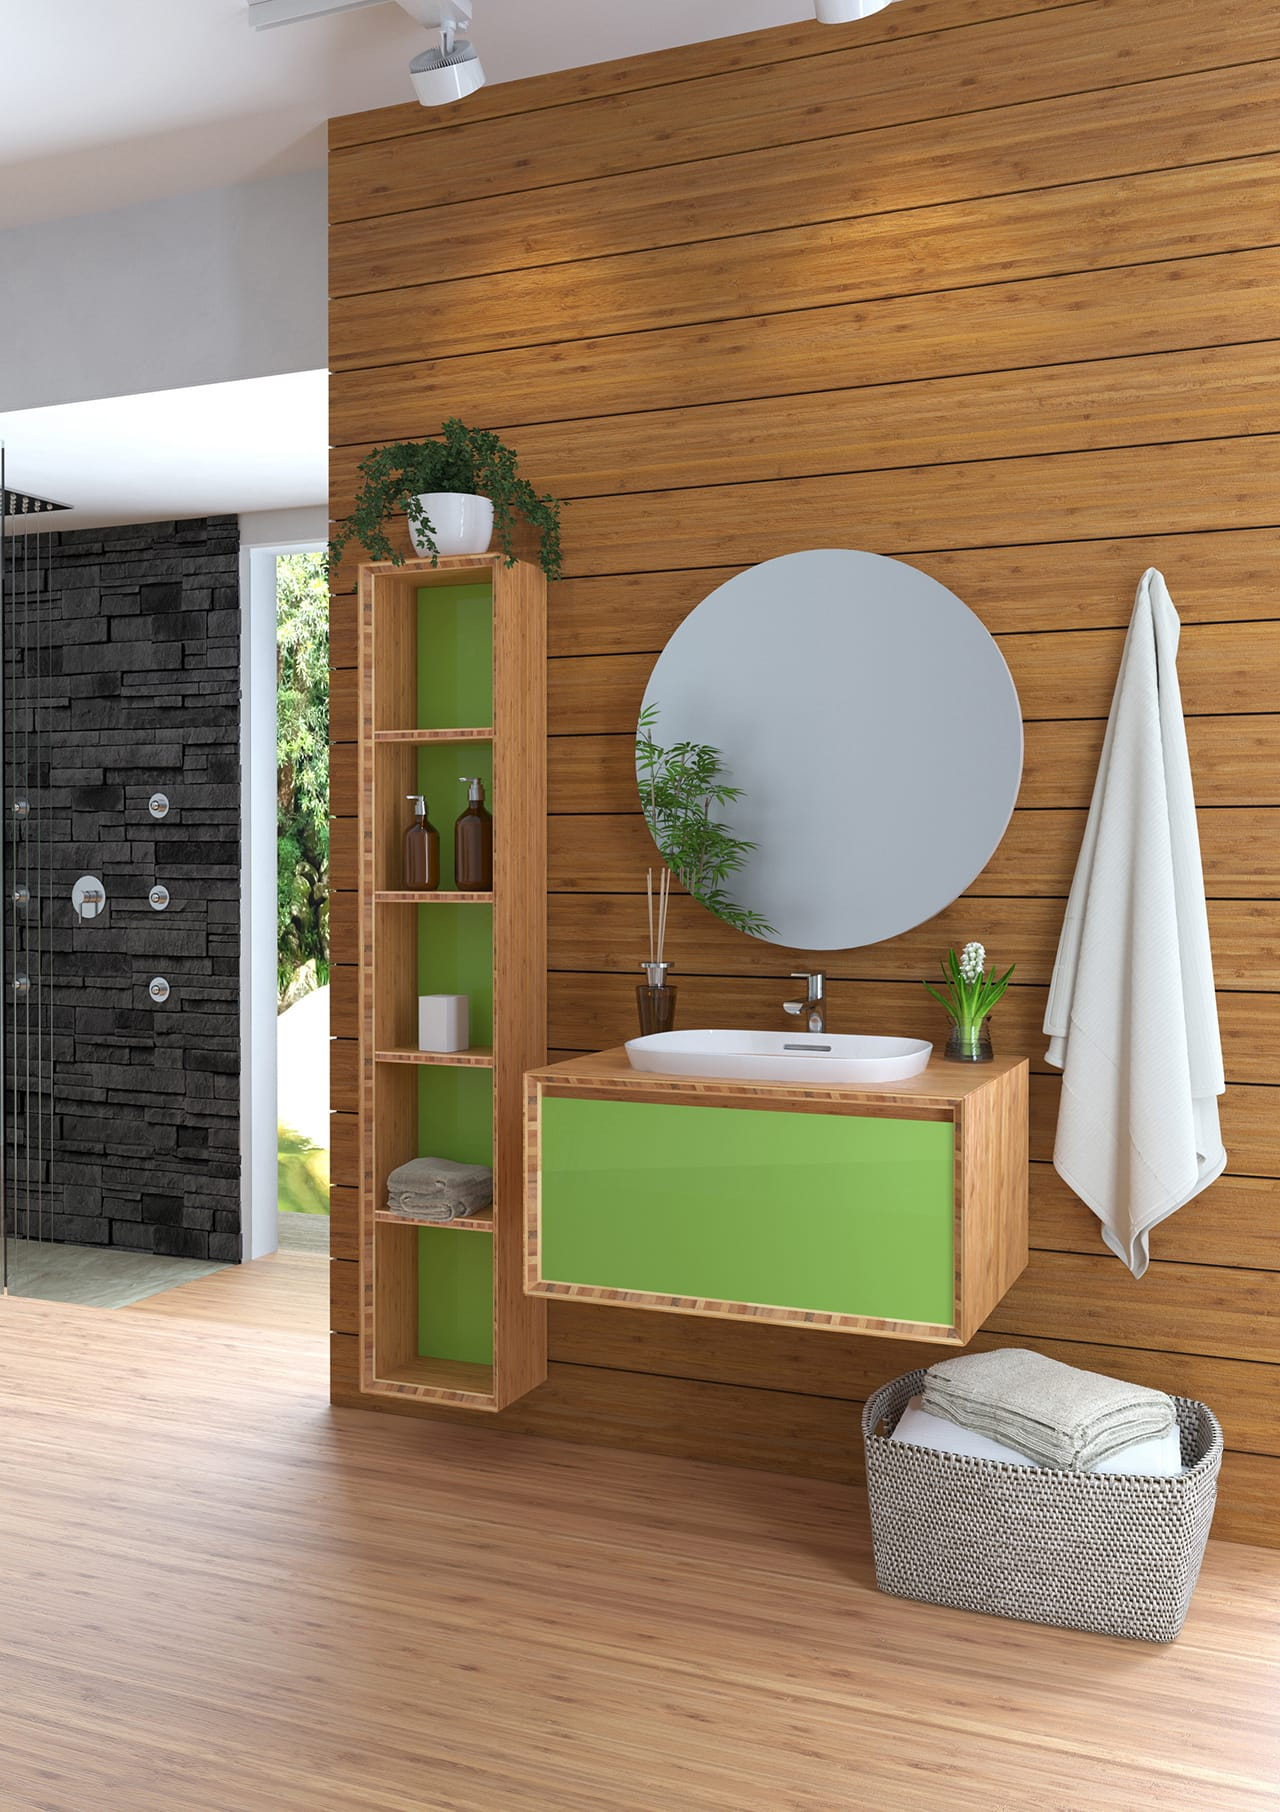 BAMBOO pavimento rivestimento forniture bagno